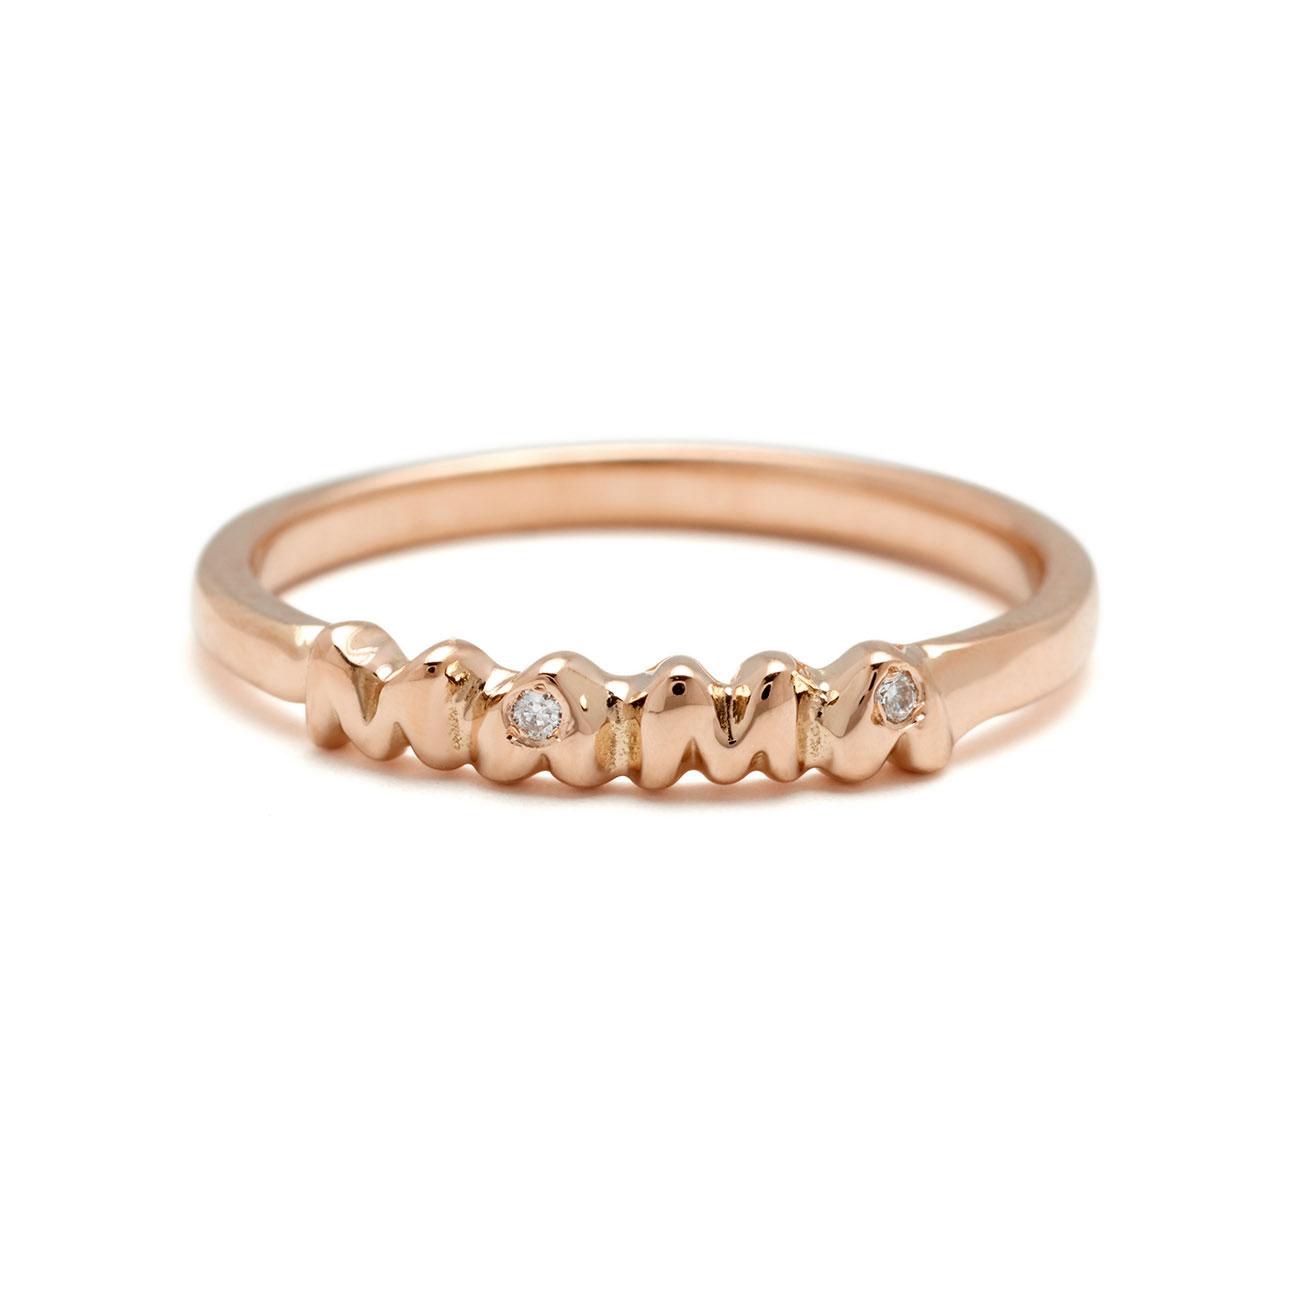 mama band ring - 18k pink gold and diamonds